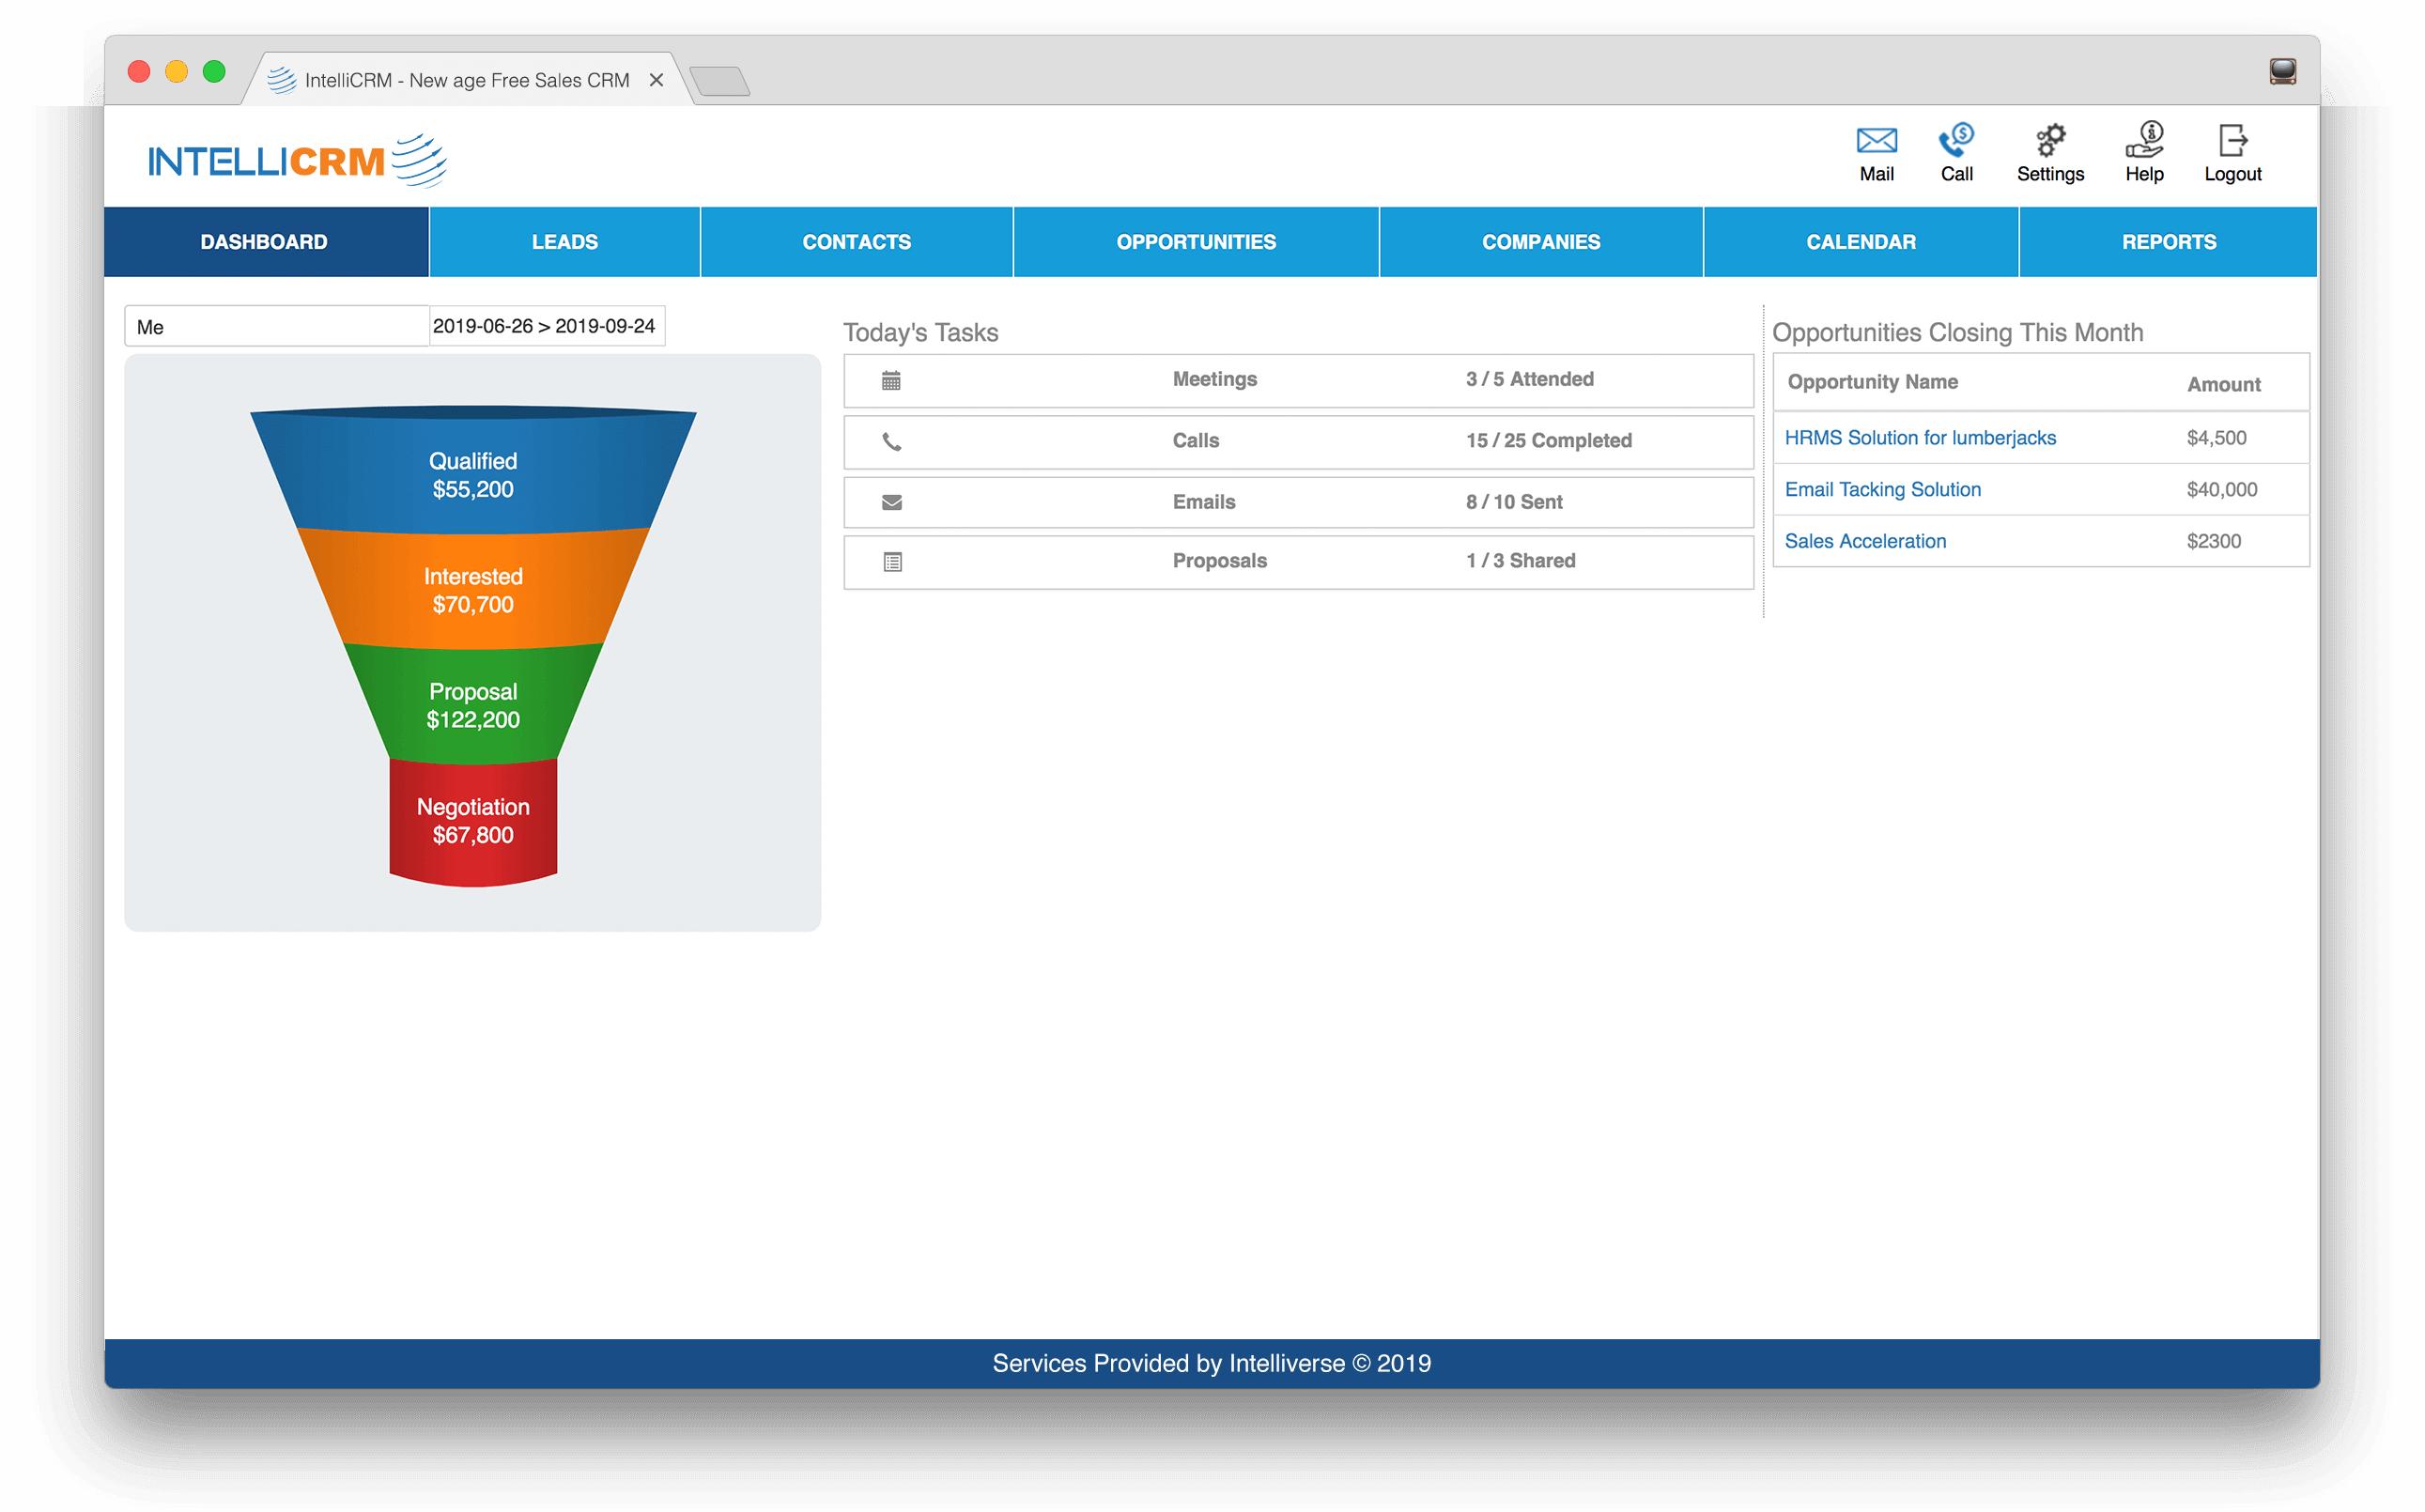 IntelliCRM Pipeline Management